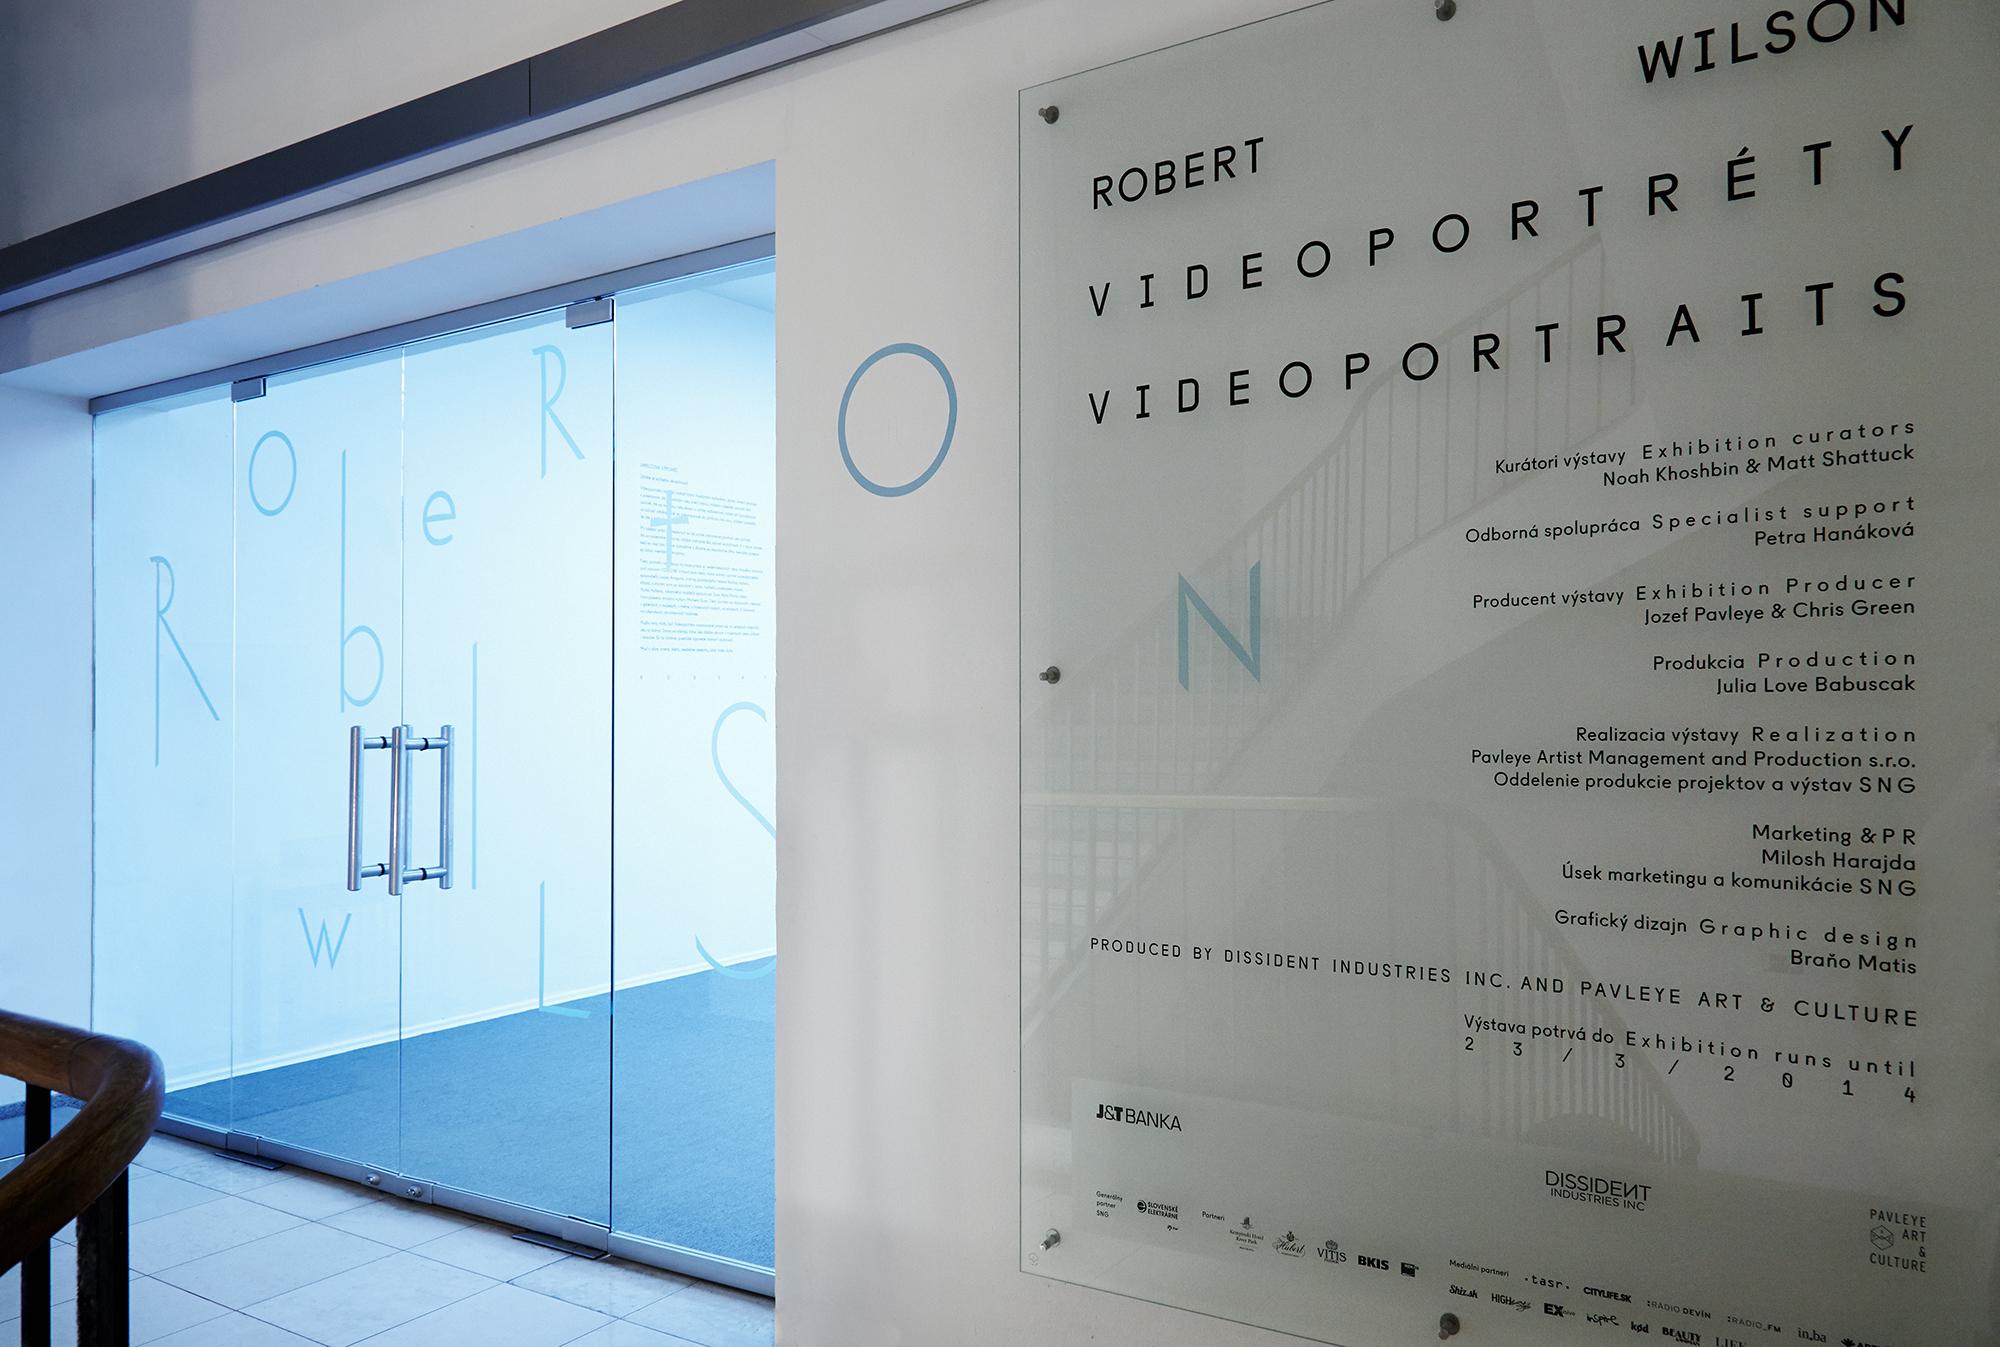 Robert_Willson_exhibition_13.jpg